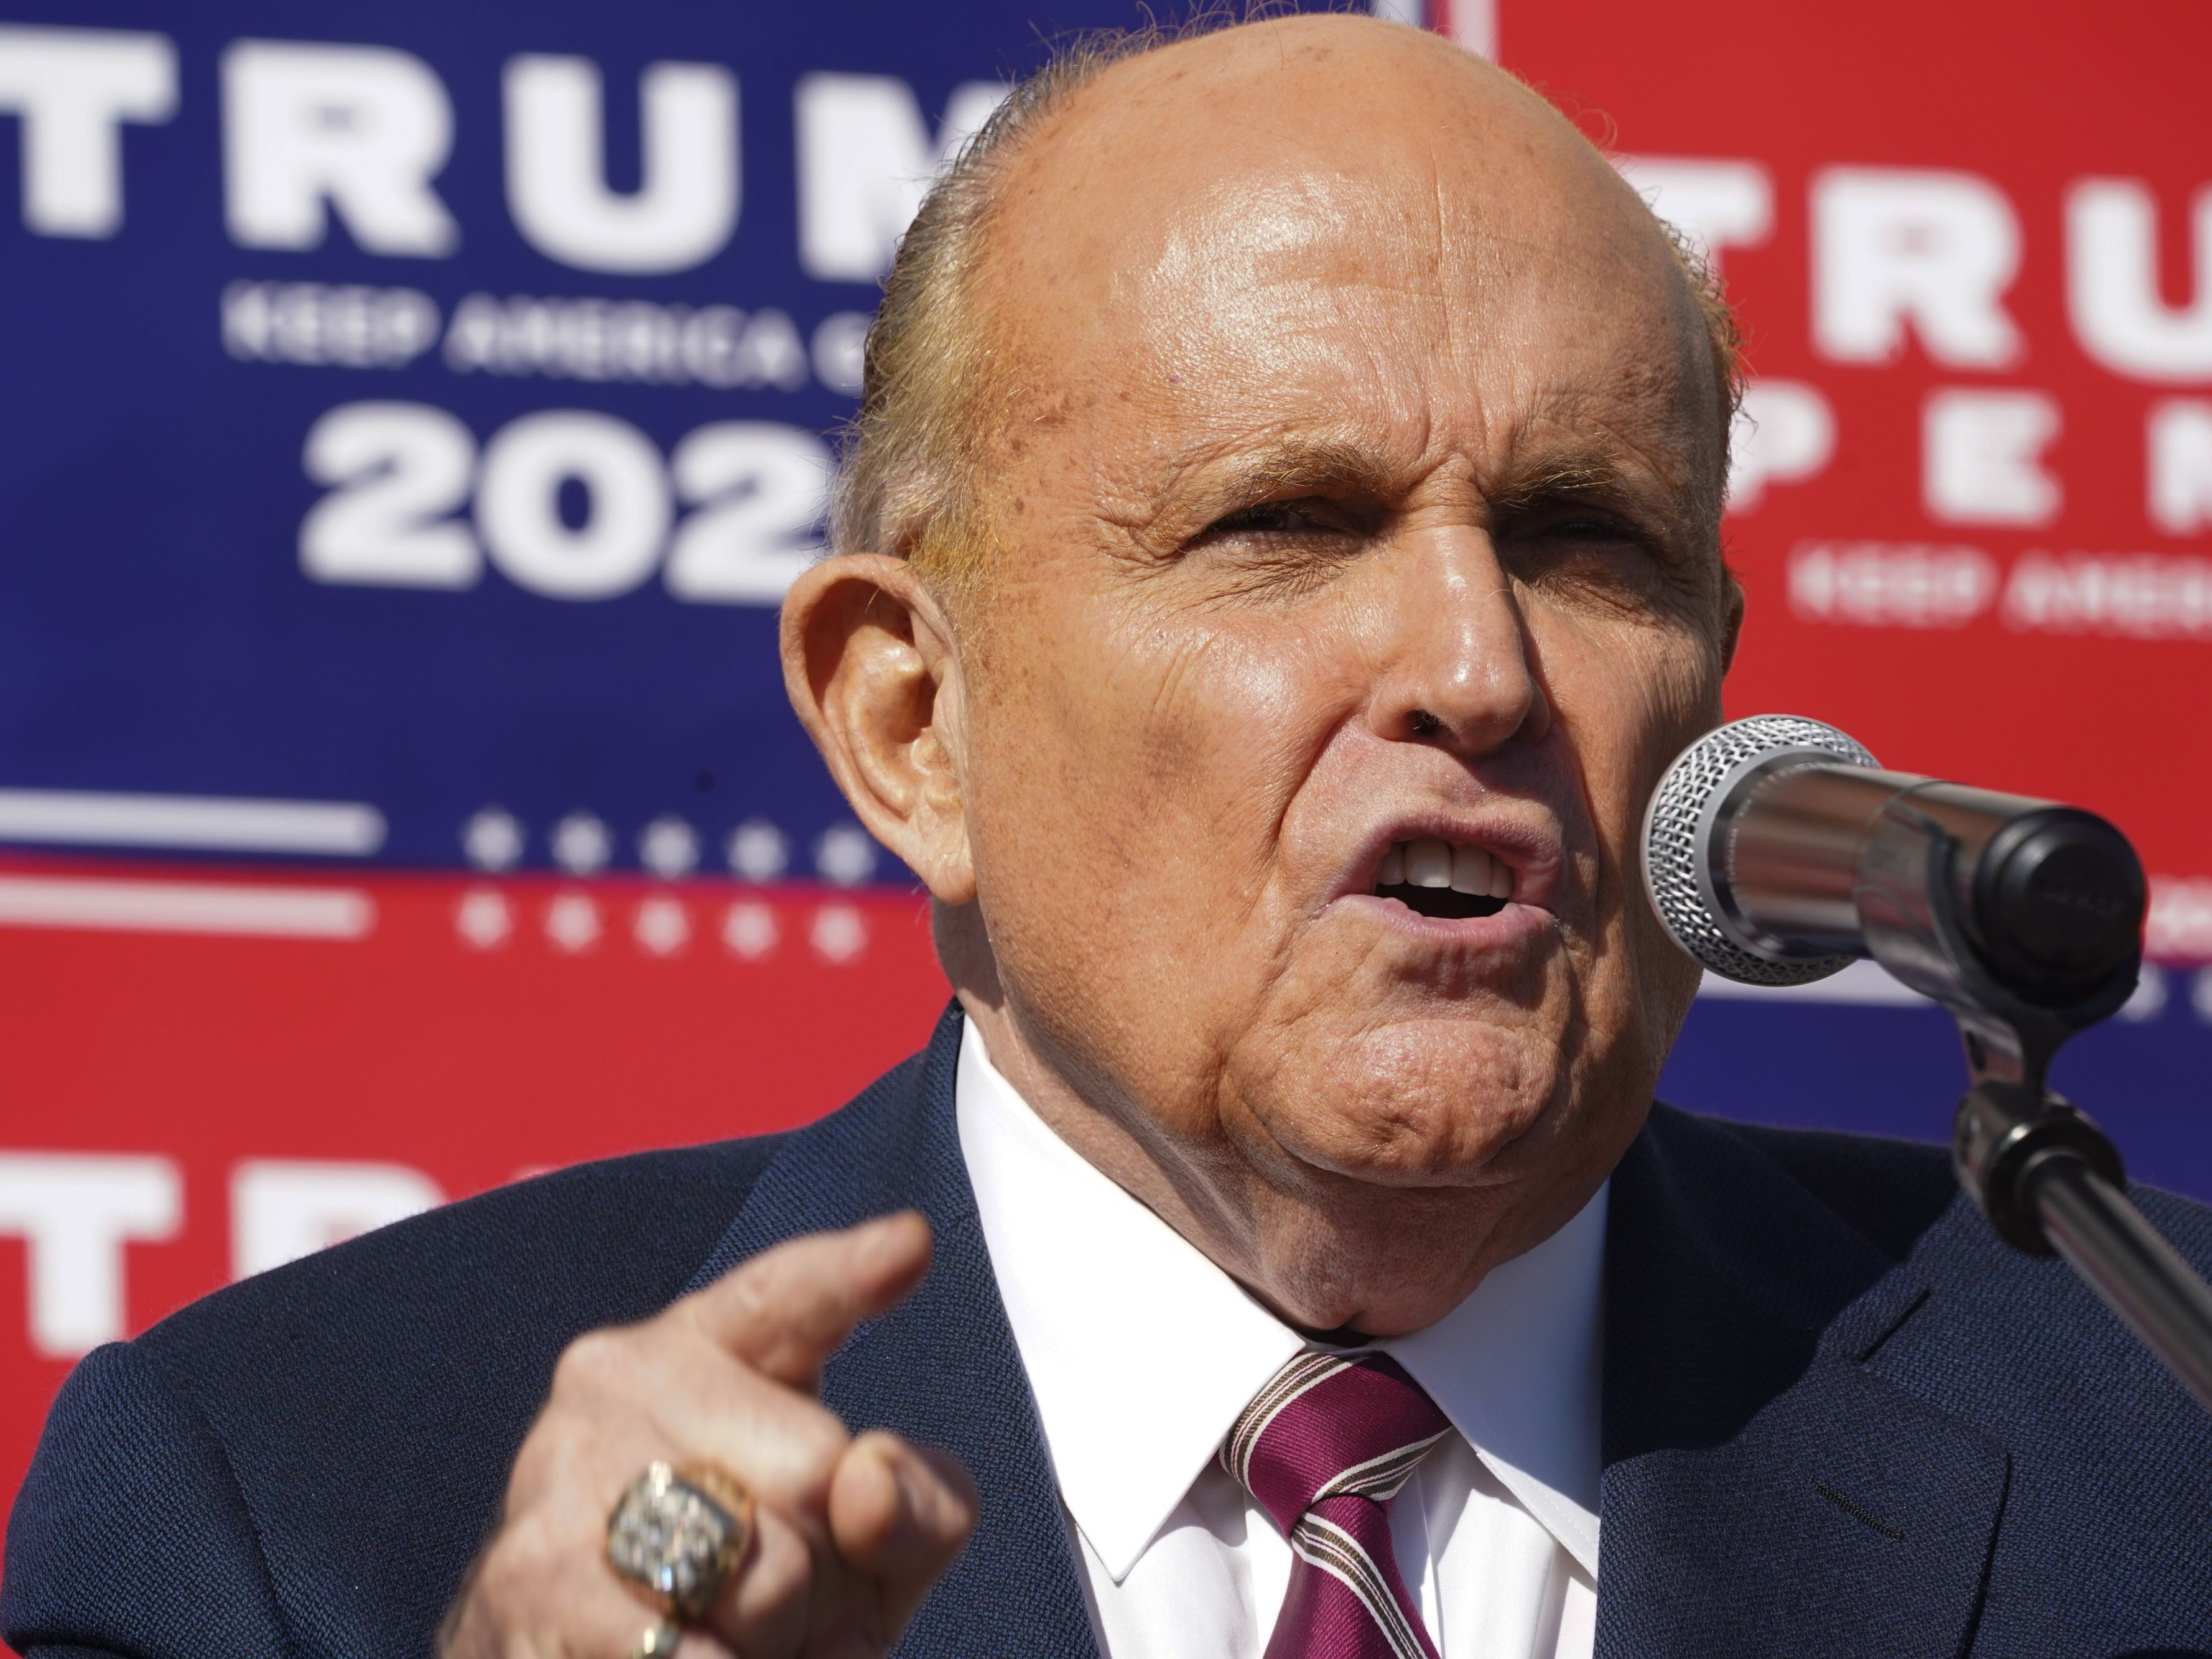 Rudy Giuliani reportedly seeks pardon from Donald Trump